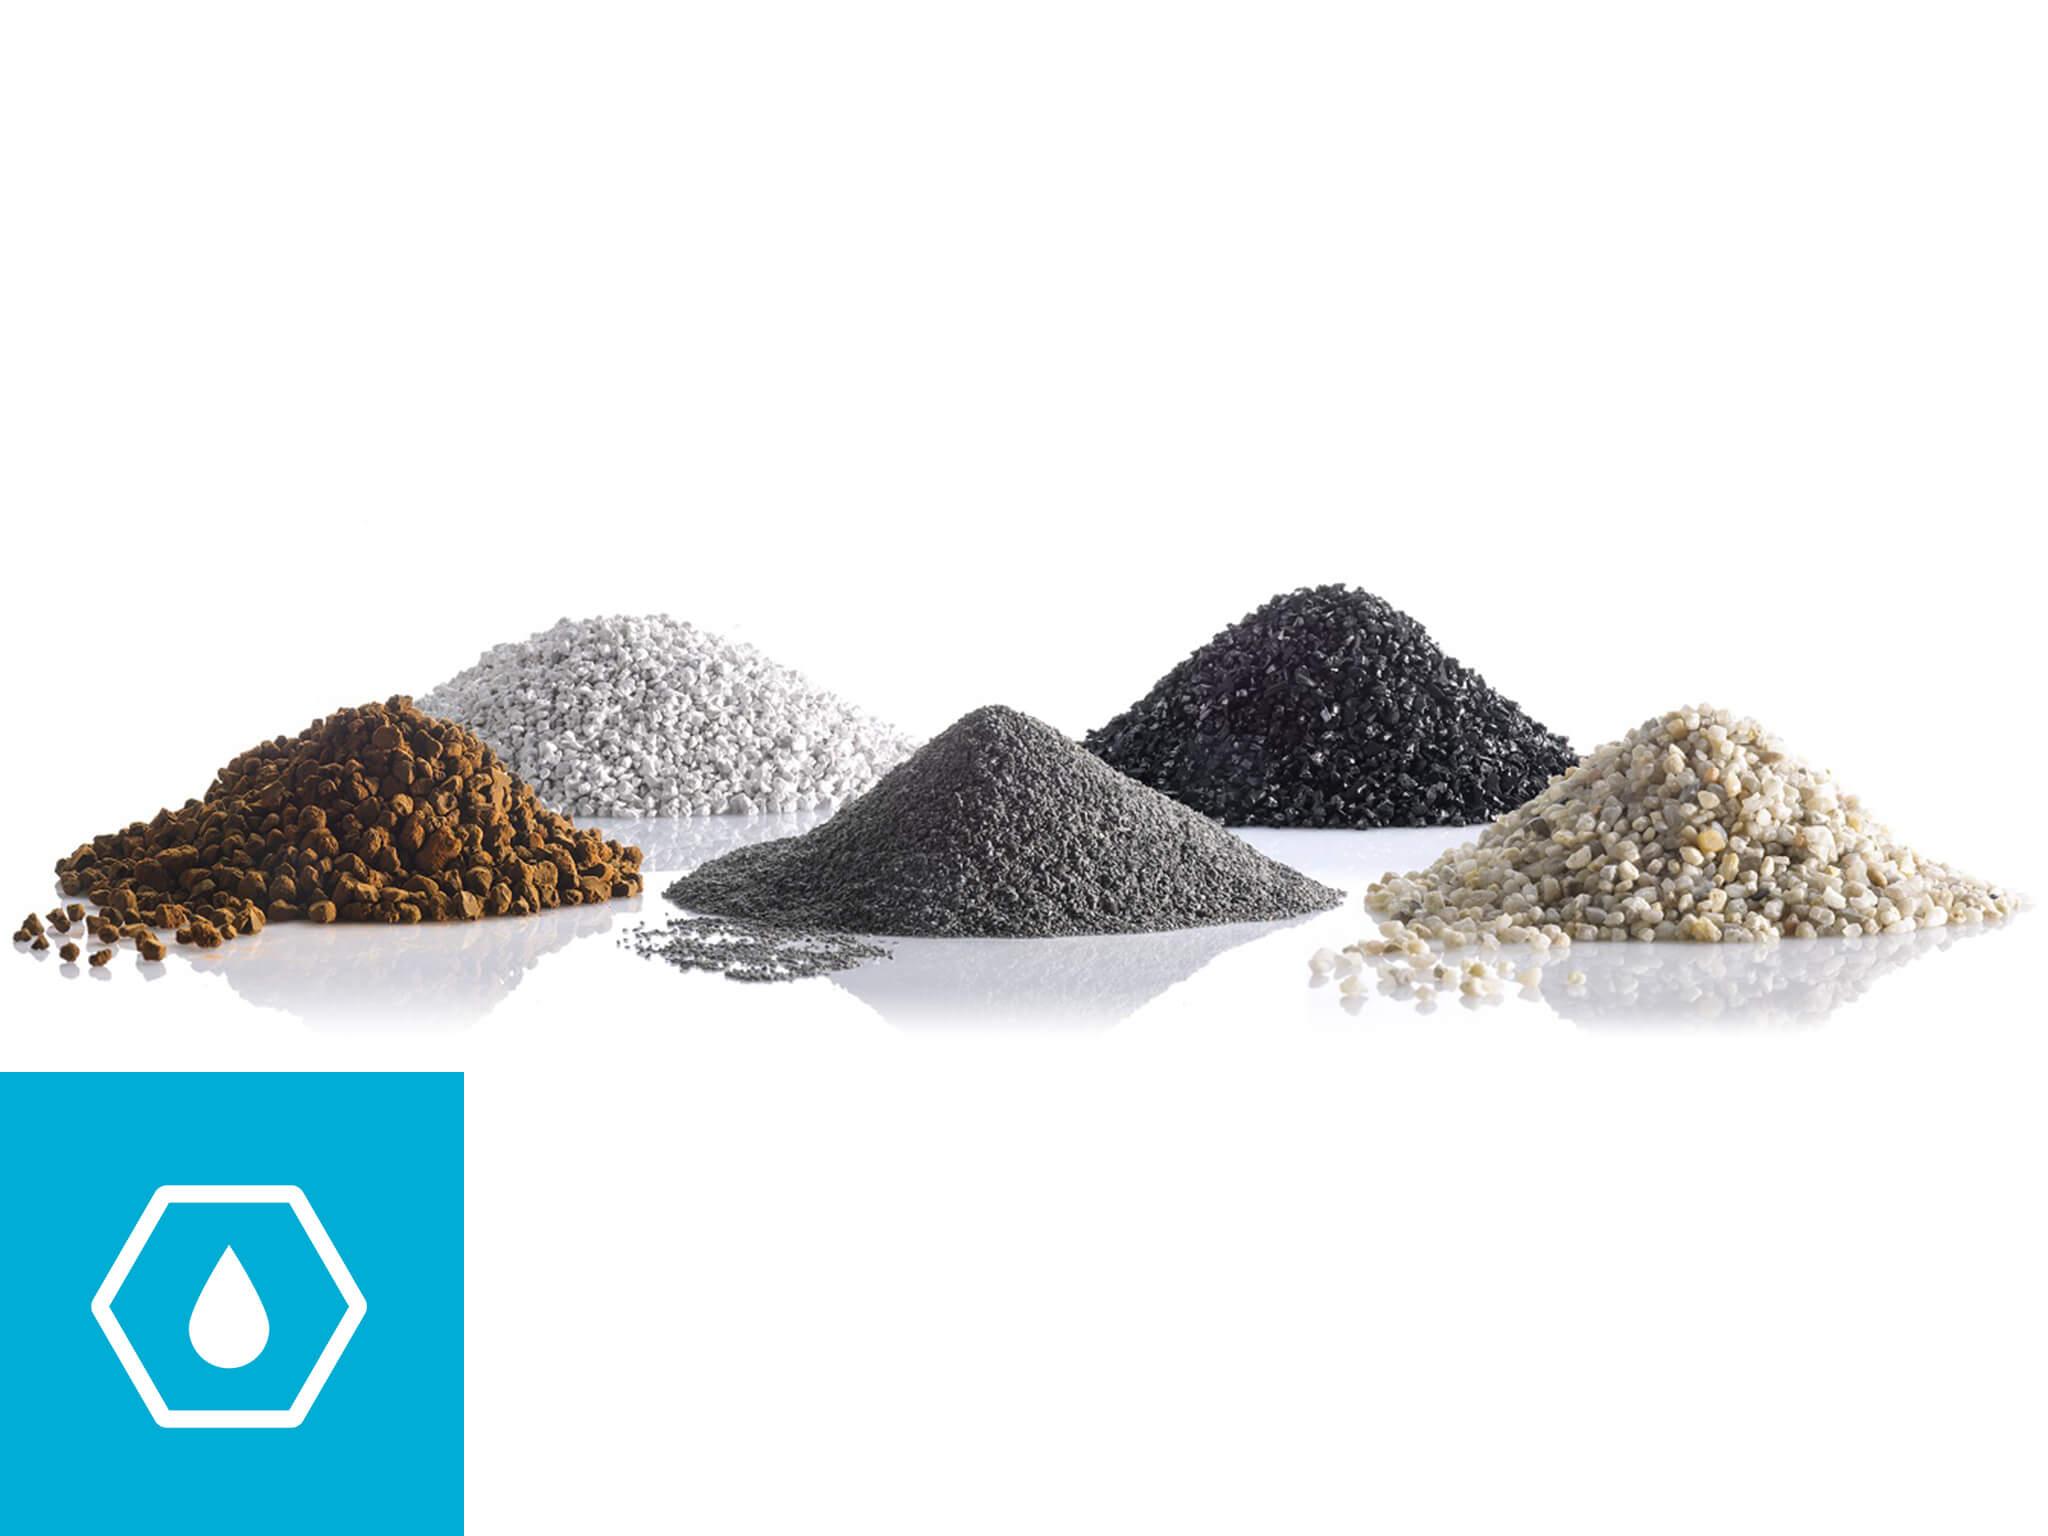 Resine e materiali filtranti carboplant srl for Tipi di materiali per tubi idraulici